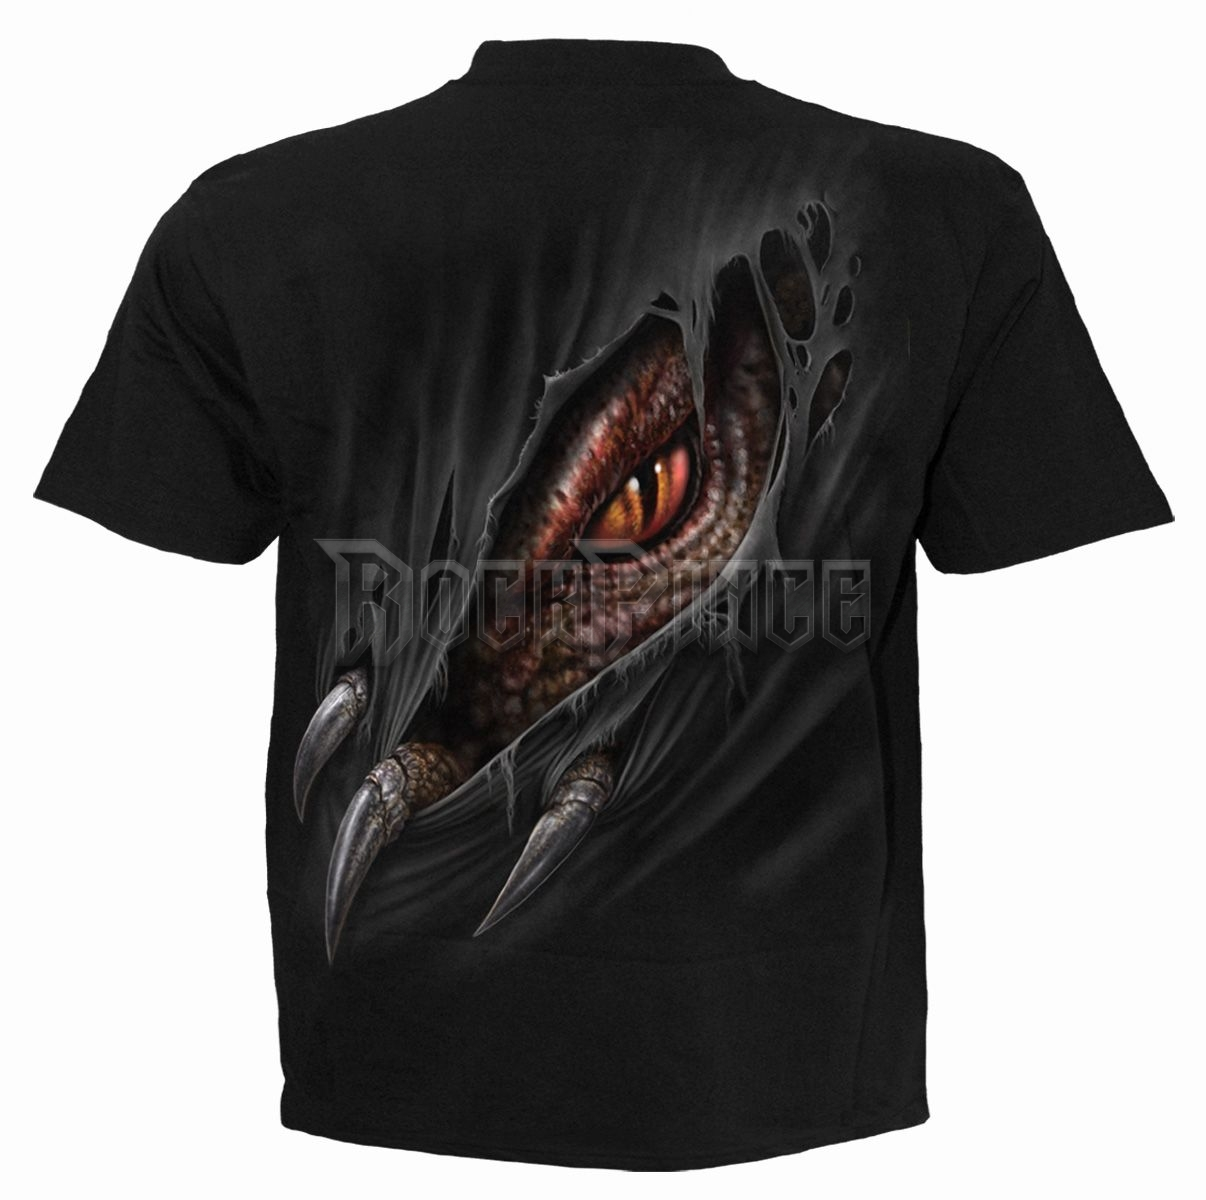 BREAKING OUT - Kids T-Shirt Black (Plain) - T171K101